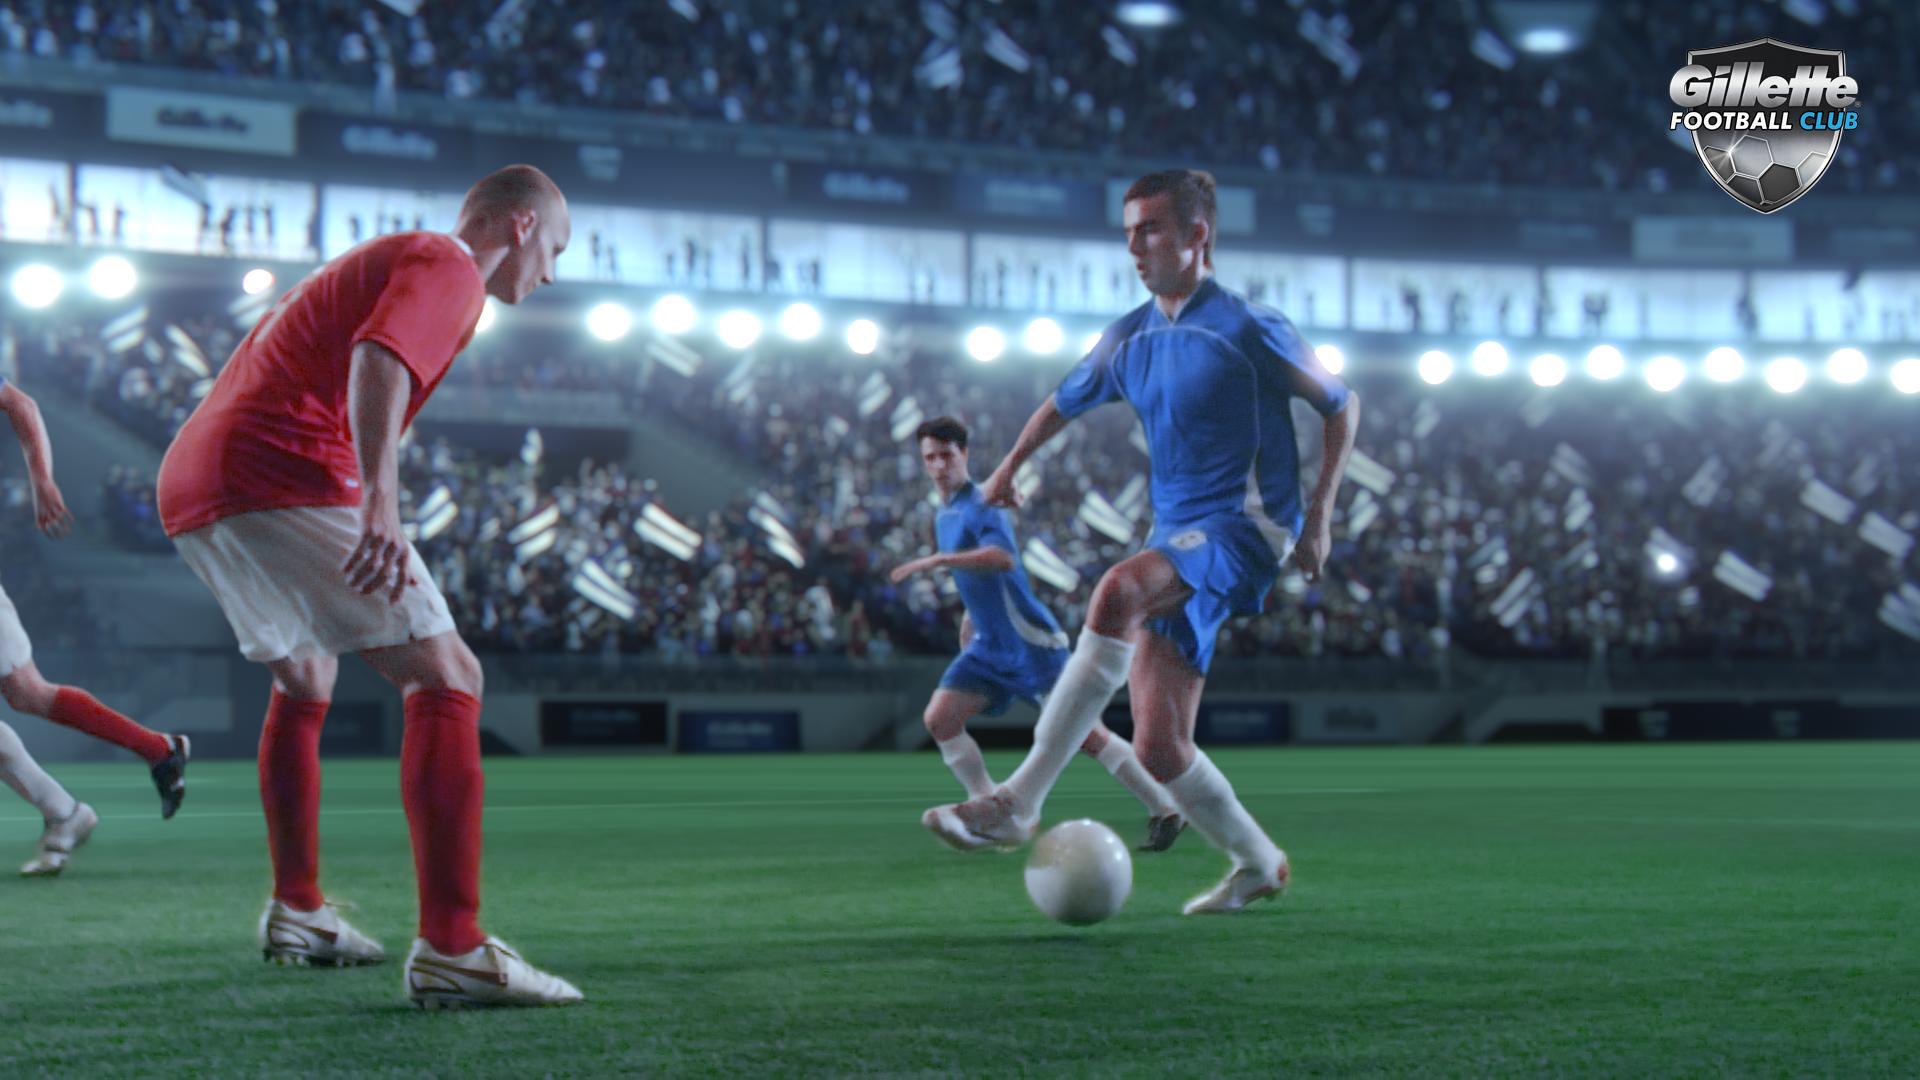 gillette_football_club_pic2